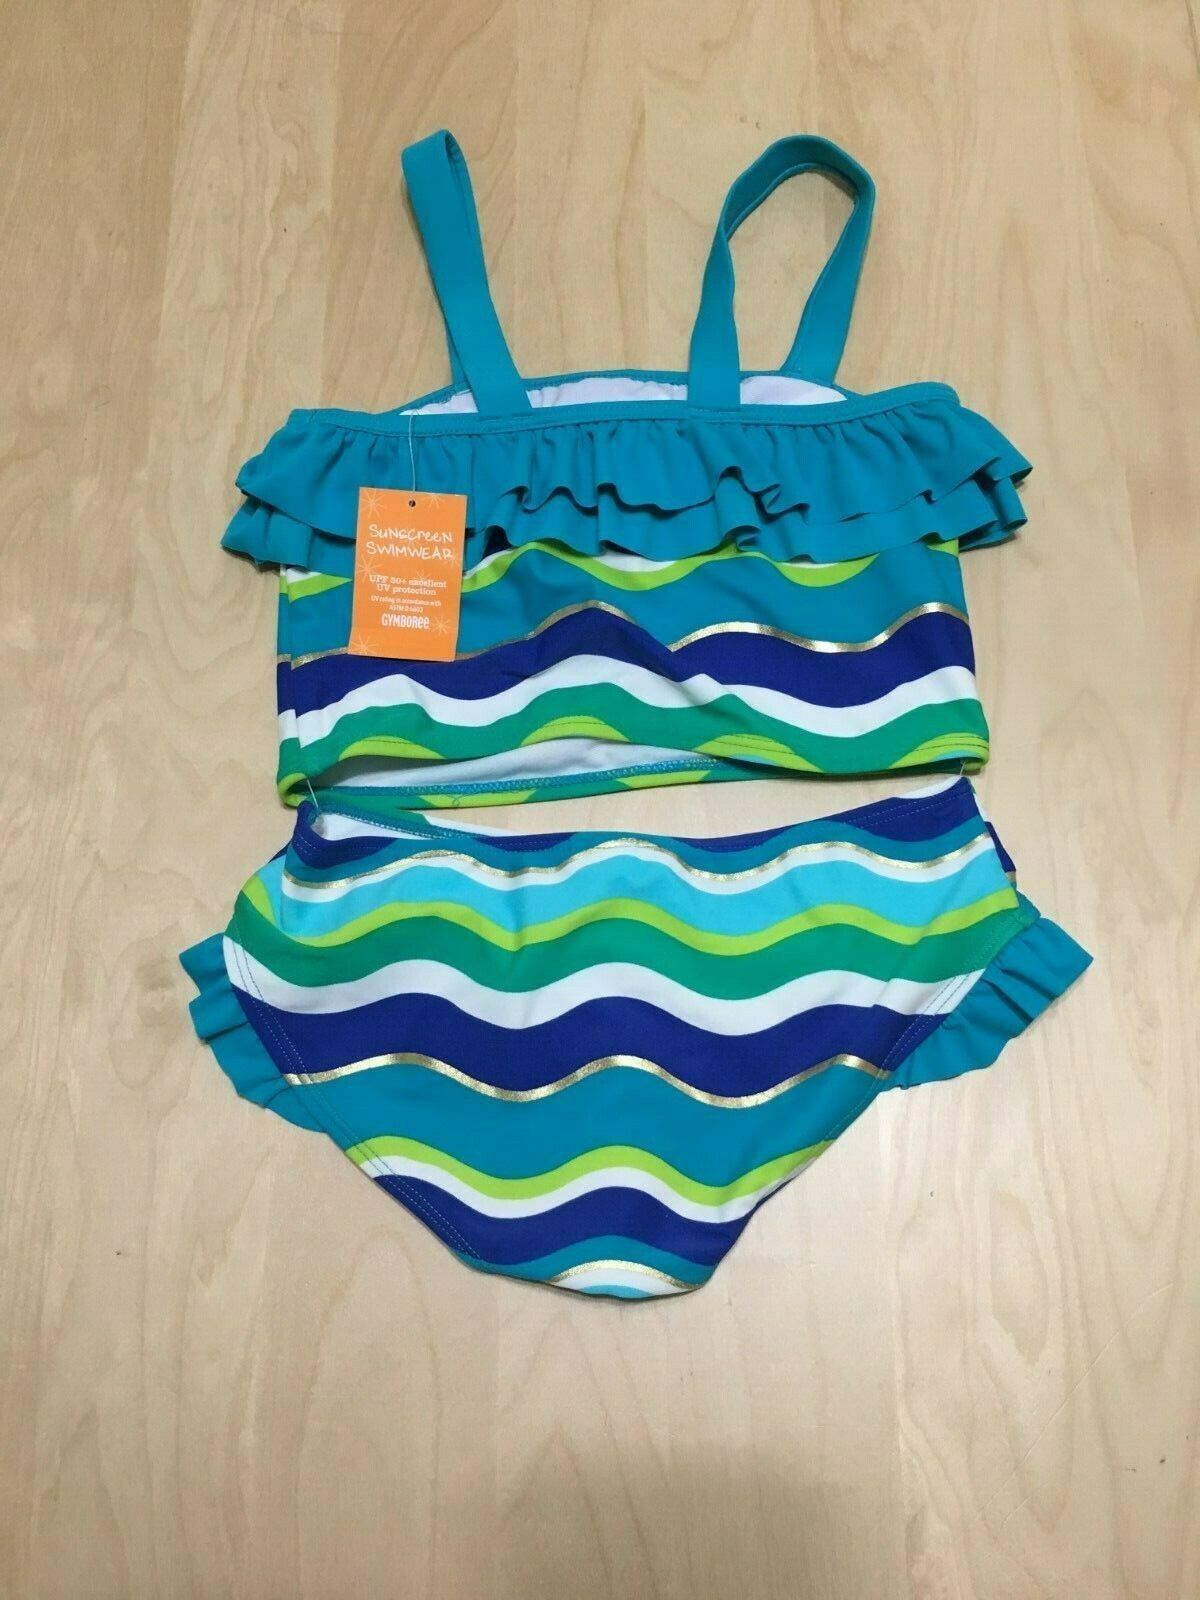 Swimsuit SunScreen UPF Gymboree Girl size 6-12 months New